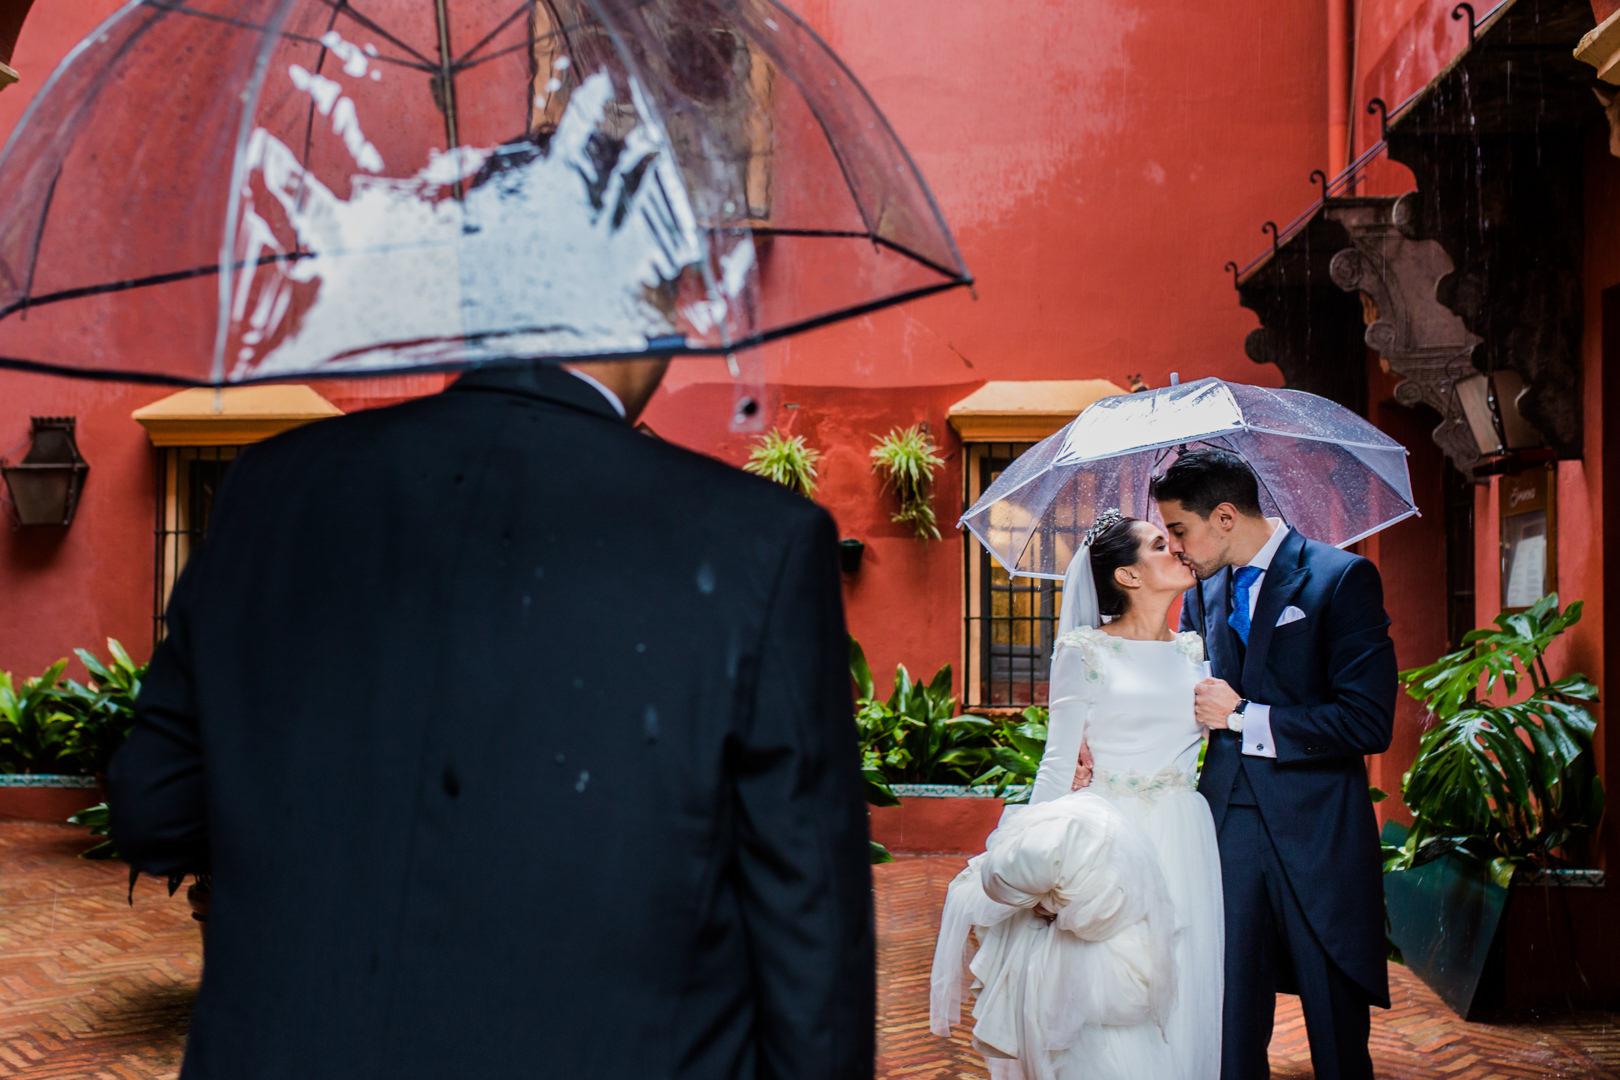 Boda-sevilla-Wedding-engagement-Rafael-Torres-fotografo-bodas-sevilla-madrid-barcelona-wedding-photographer--49.jpg